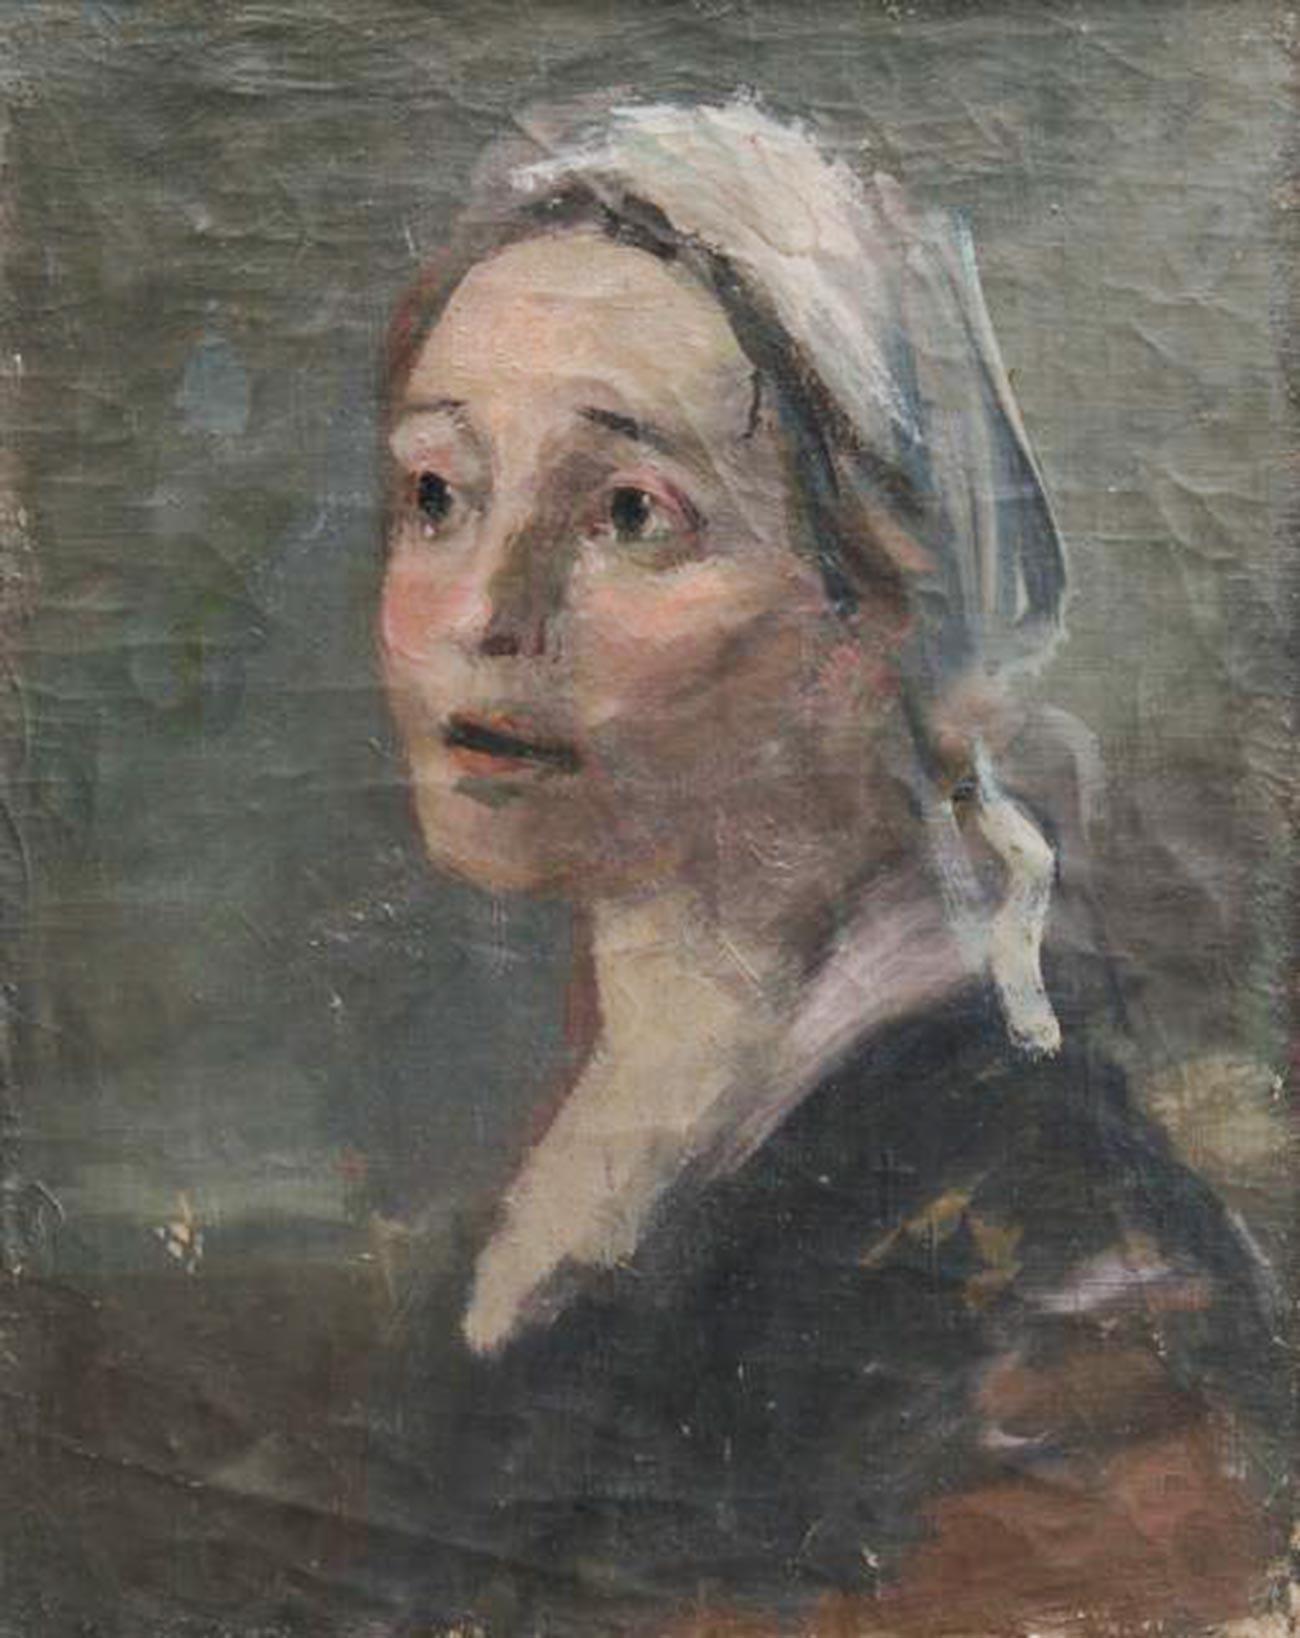 K・ルダコフ、『母。封鎖』